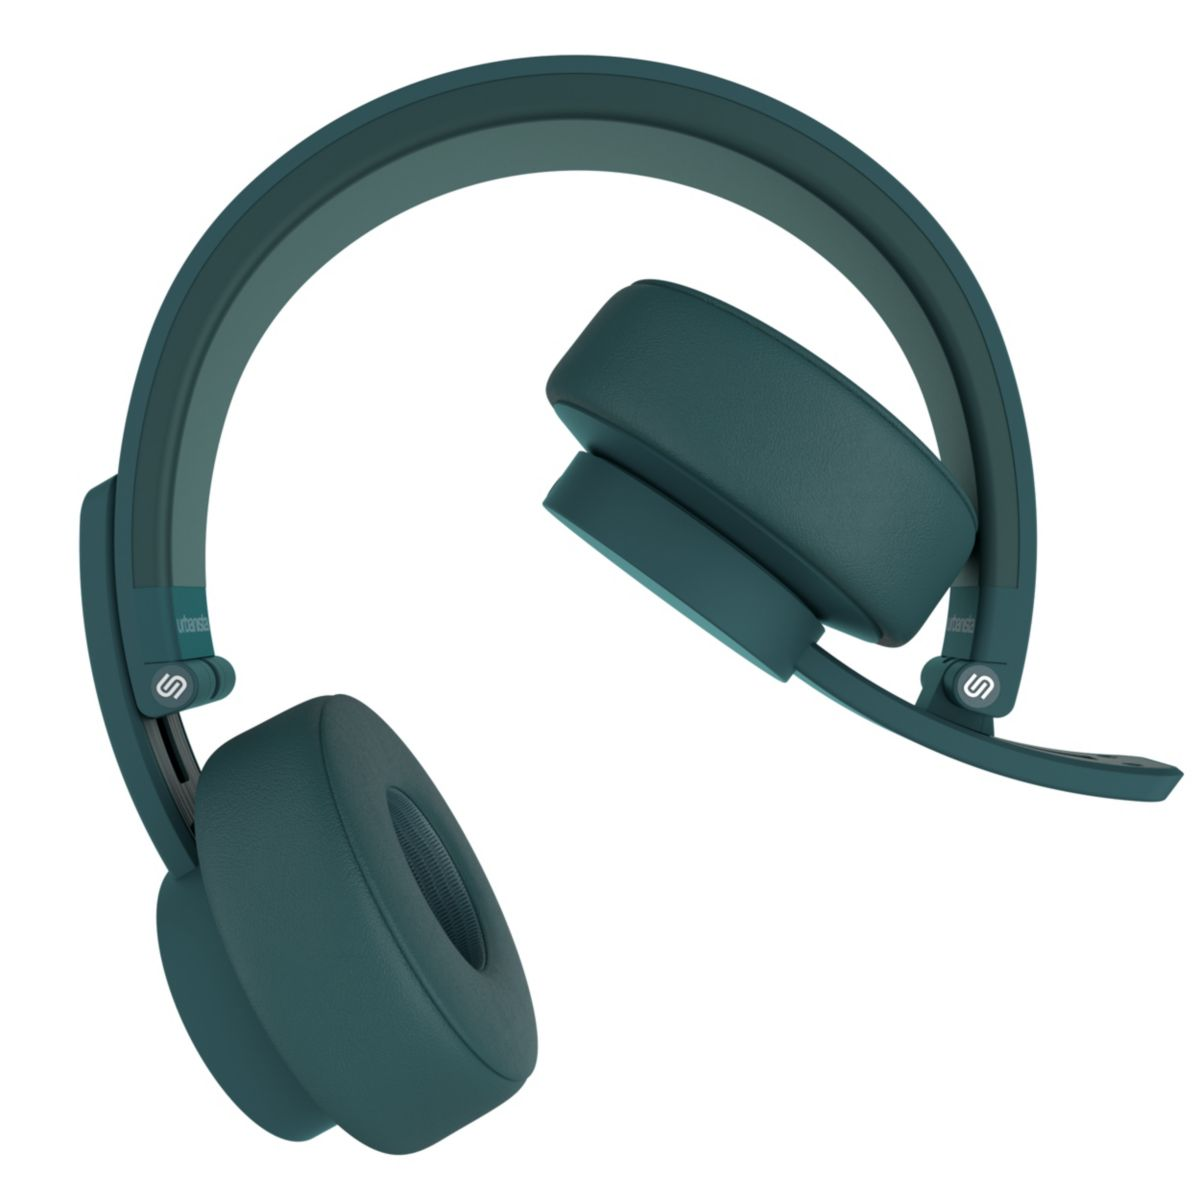 Urbanista On-Ear Kopfhörer mit integriertem Mik...